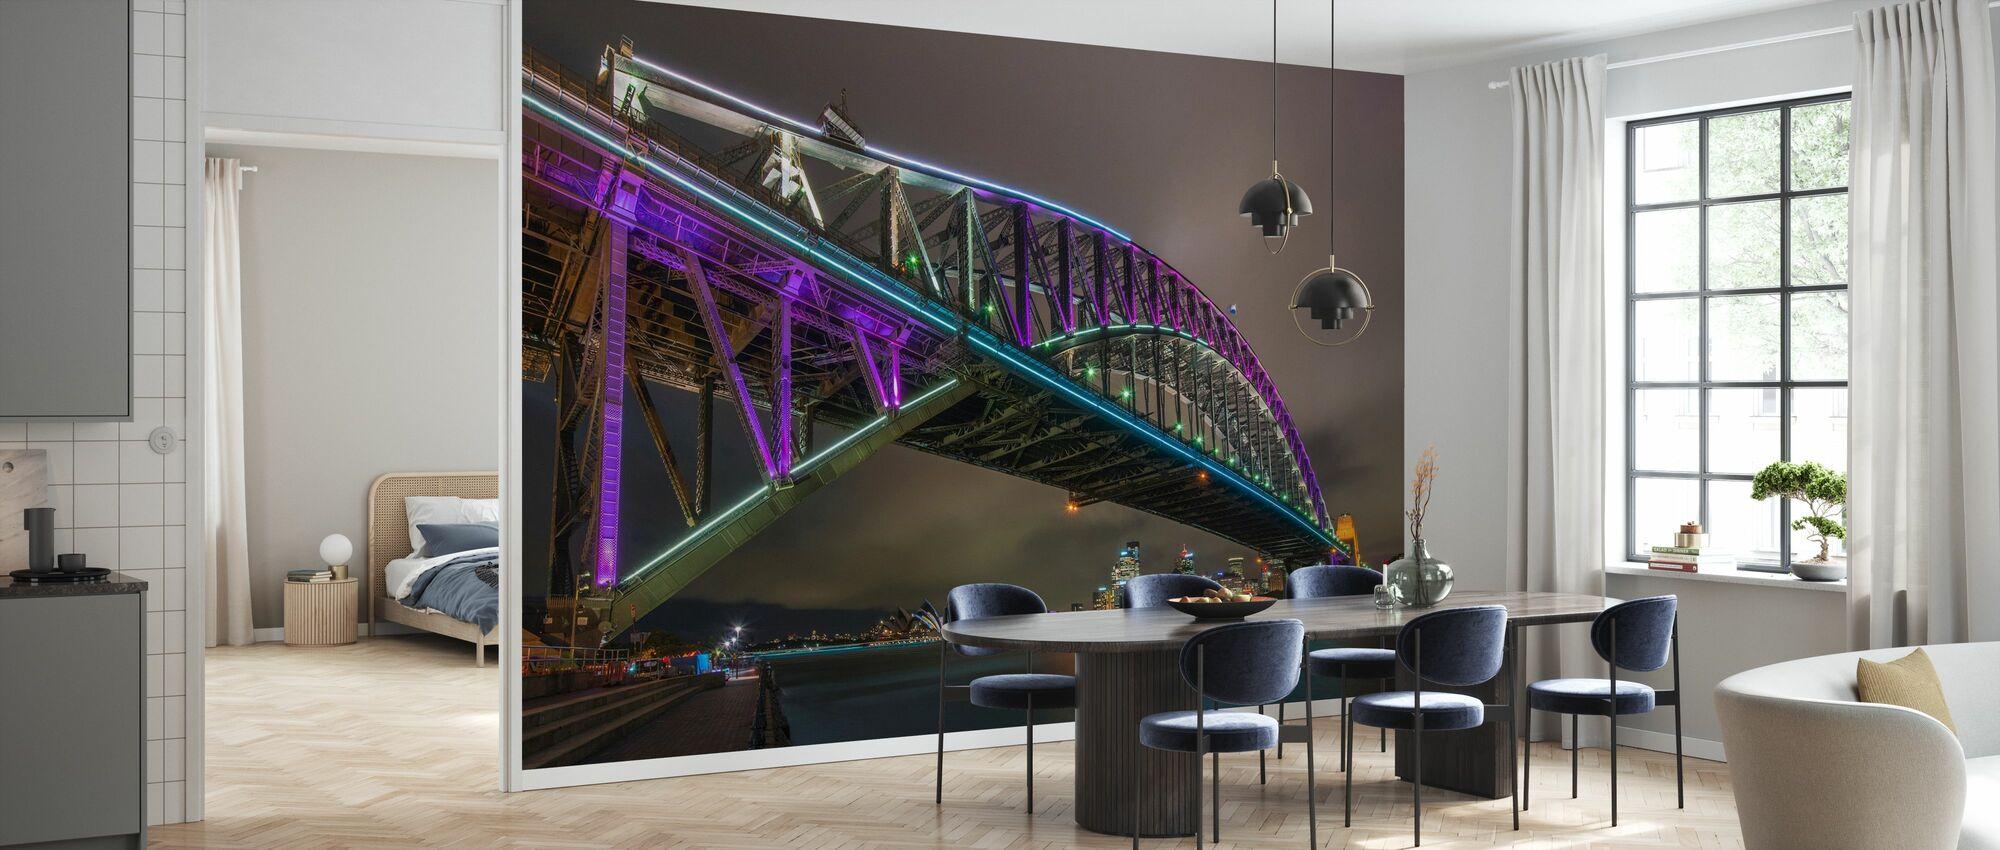 Sydney Harbour Bridge - Wallpaper - Kitchen